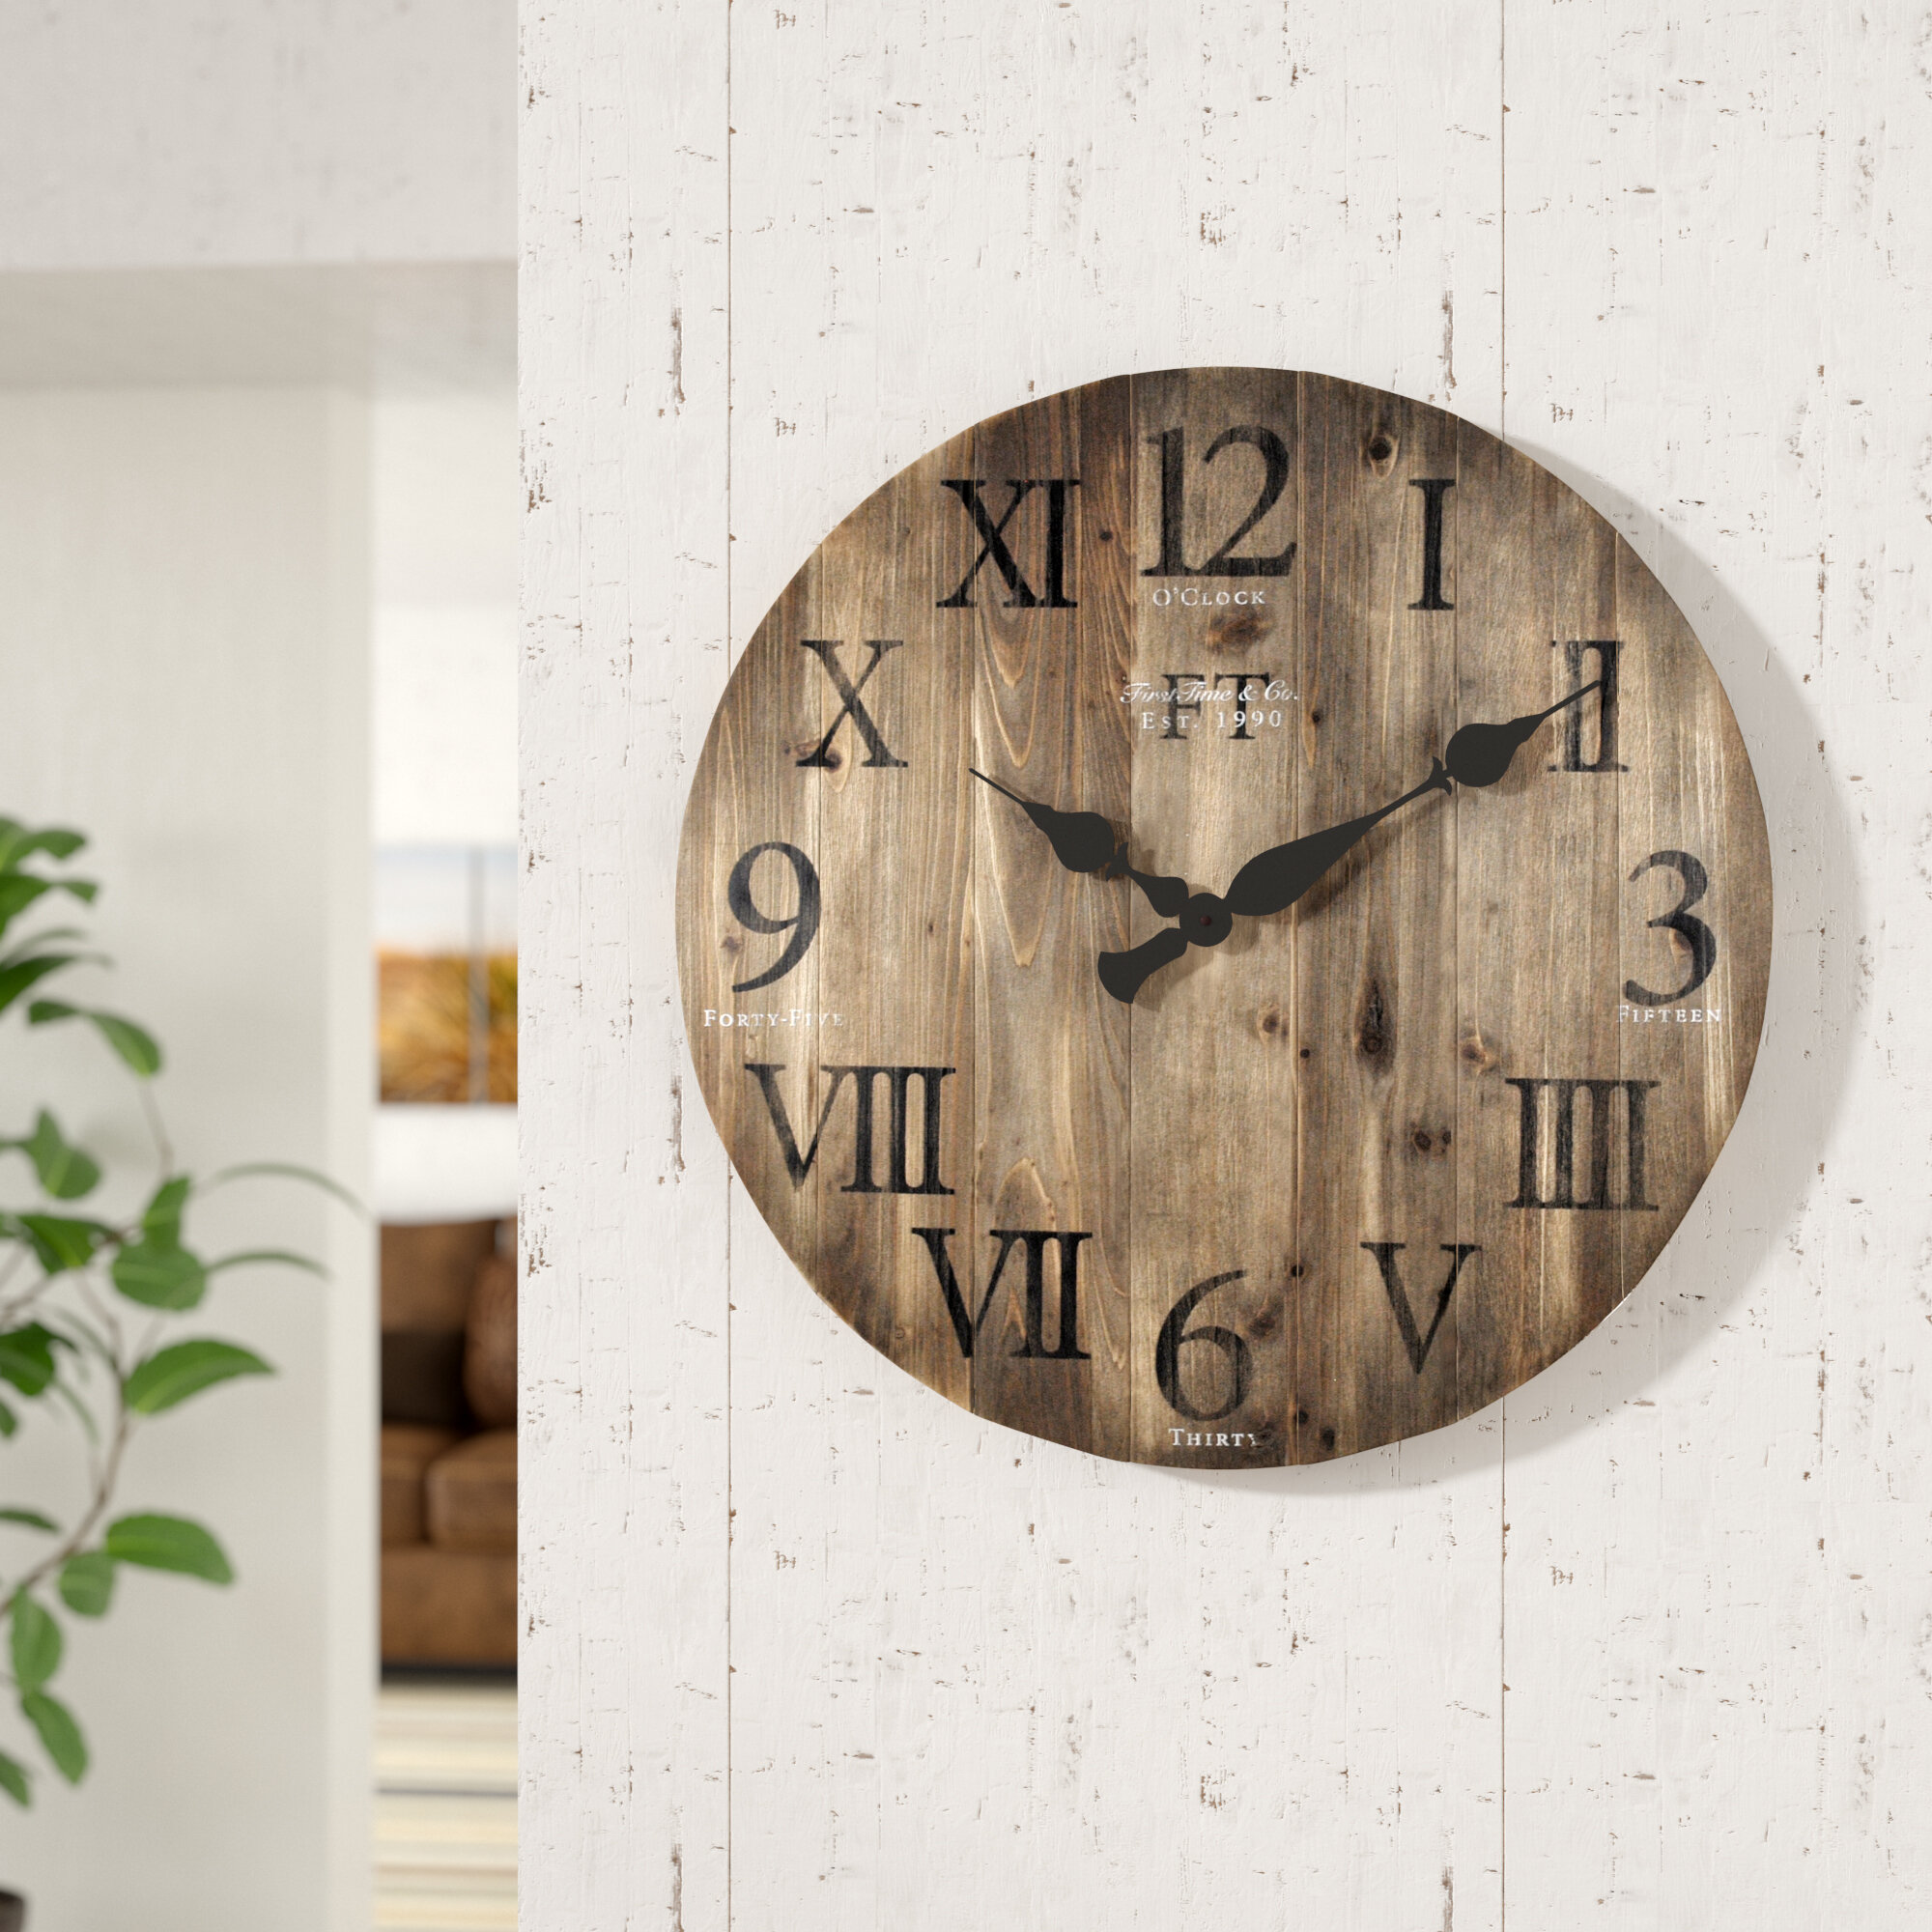 Millwood Pines Wall Clocks You Ll Love In 2021 Wayfair